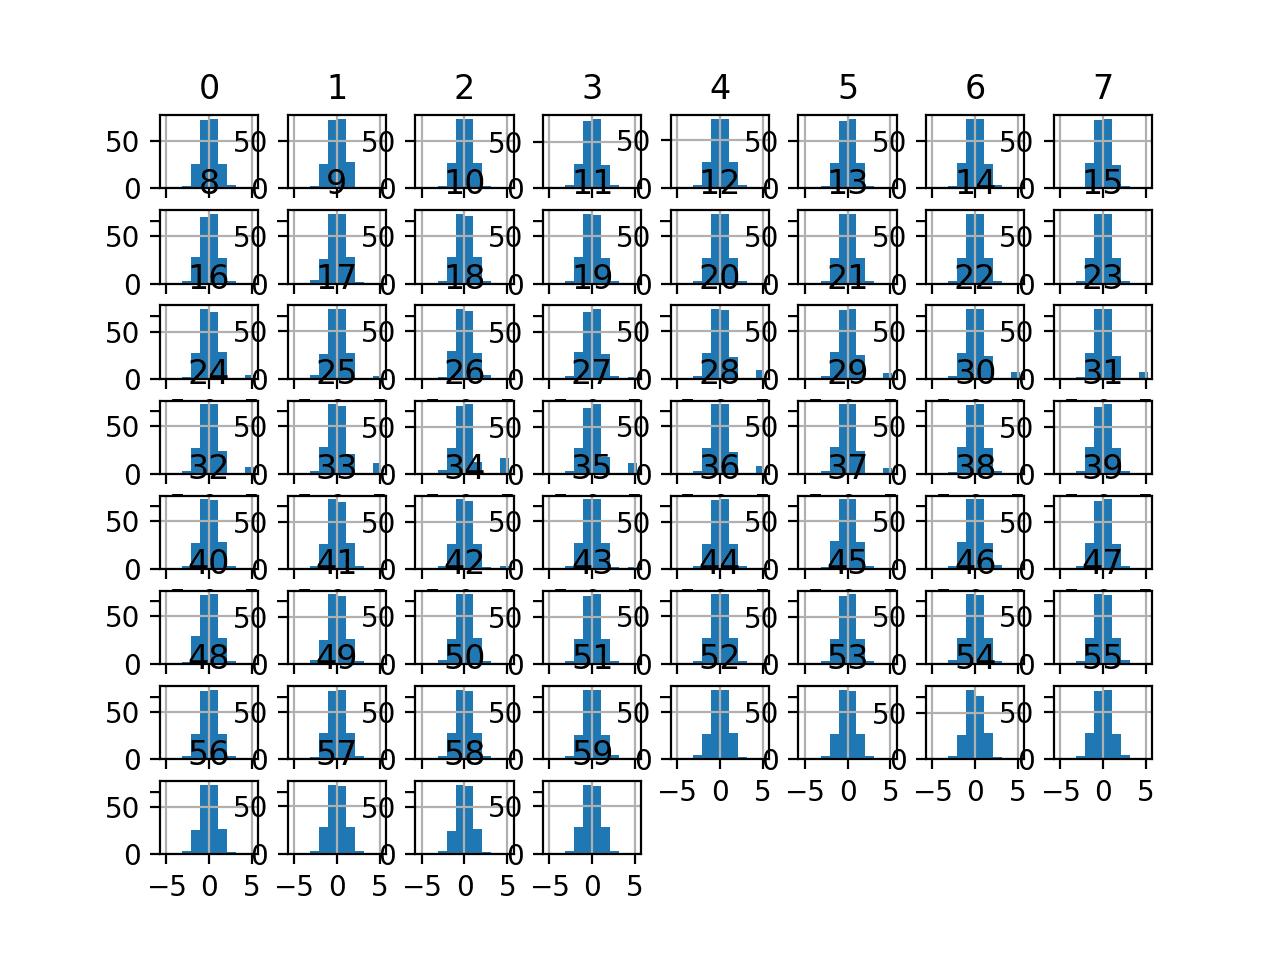 Histogram Plots of Normal Quantile Transformed Input Variables for the Sonar Dataset